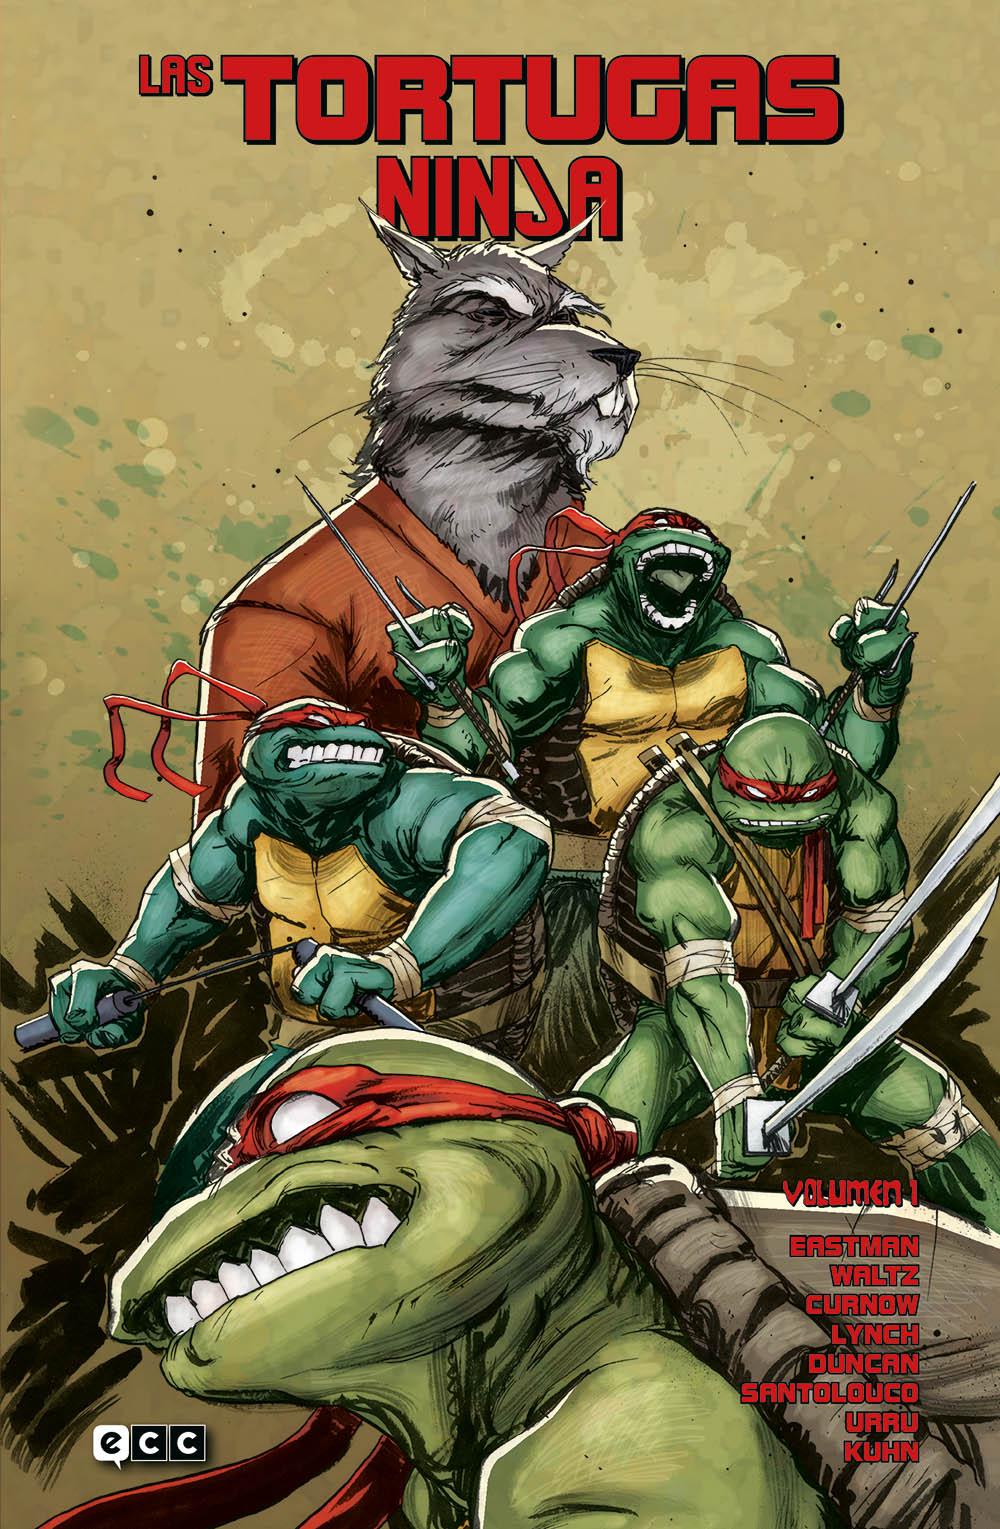 Las Tortugas Ninja Vol.01